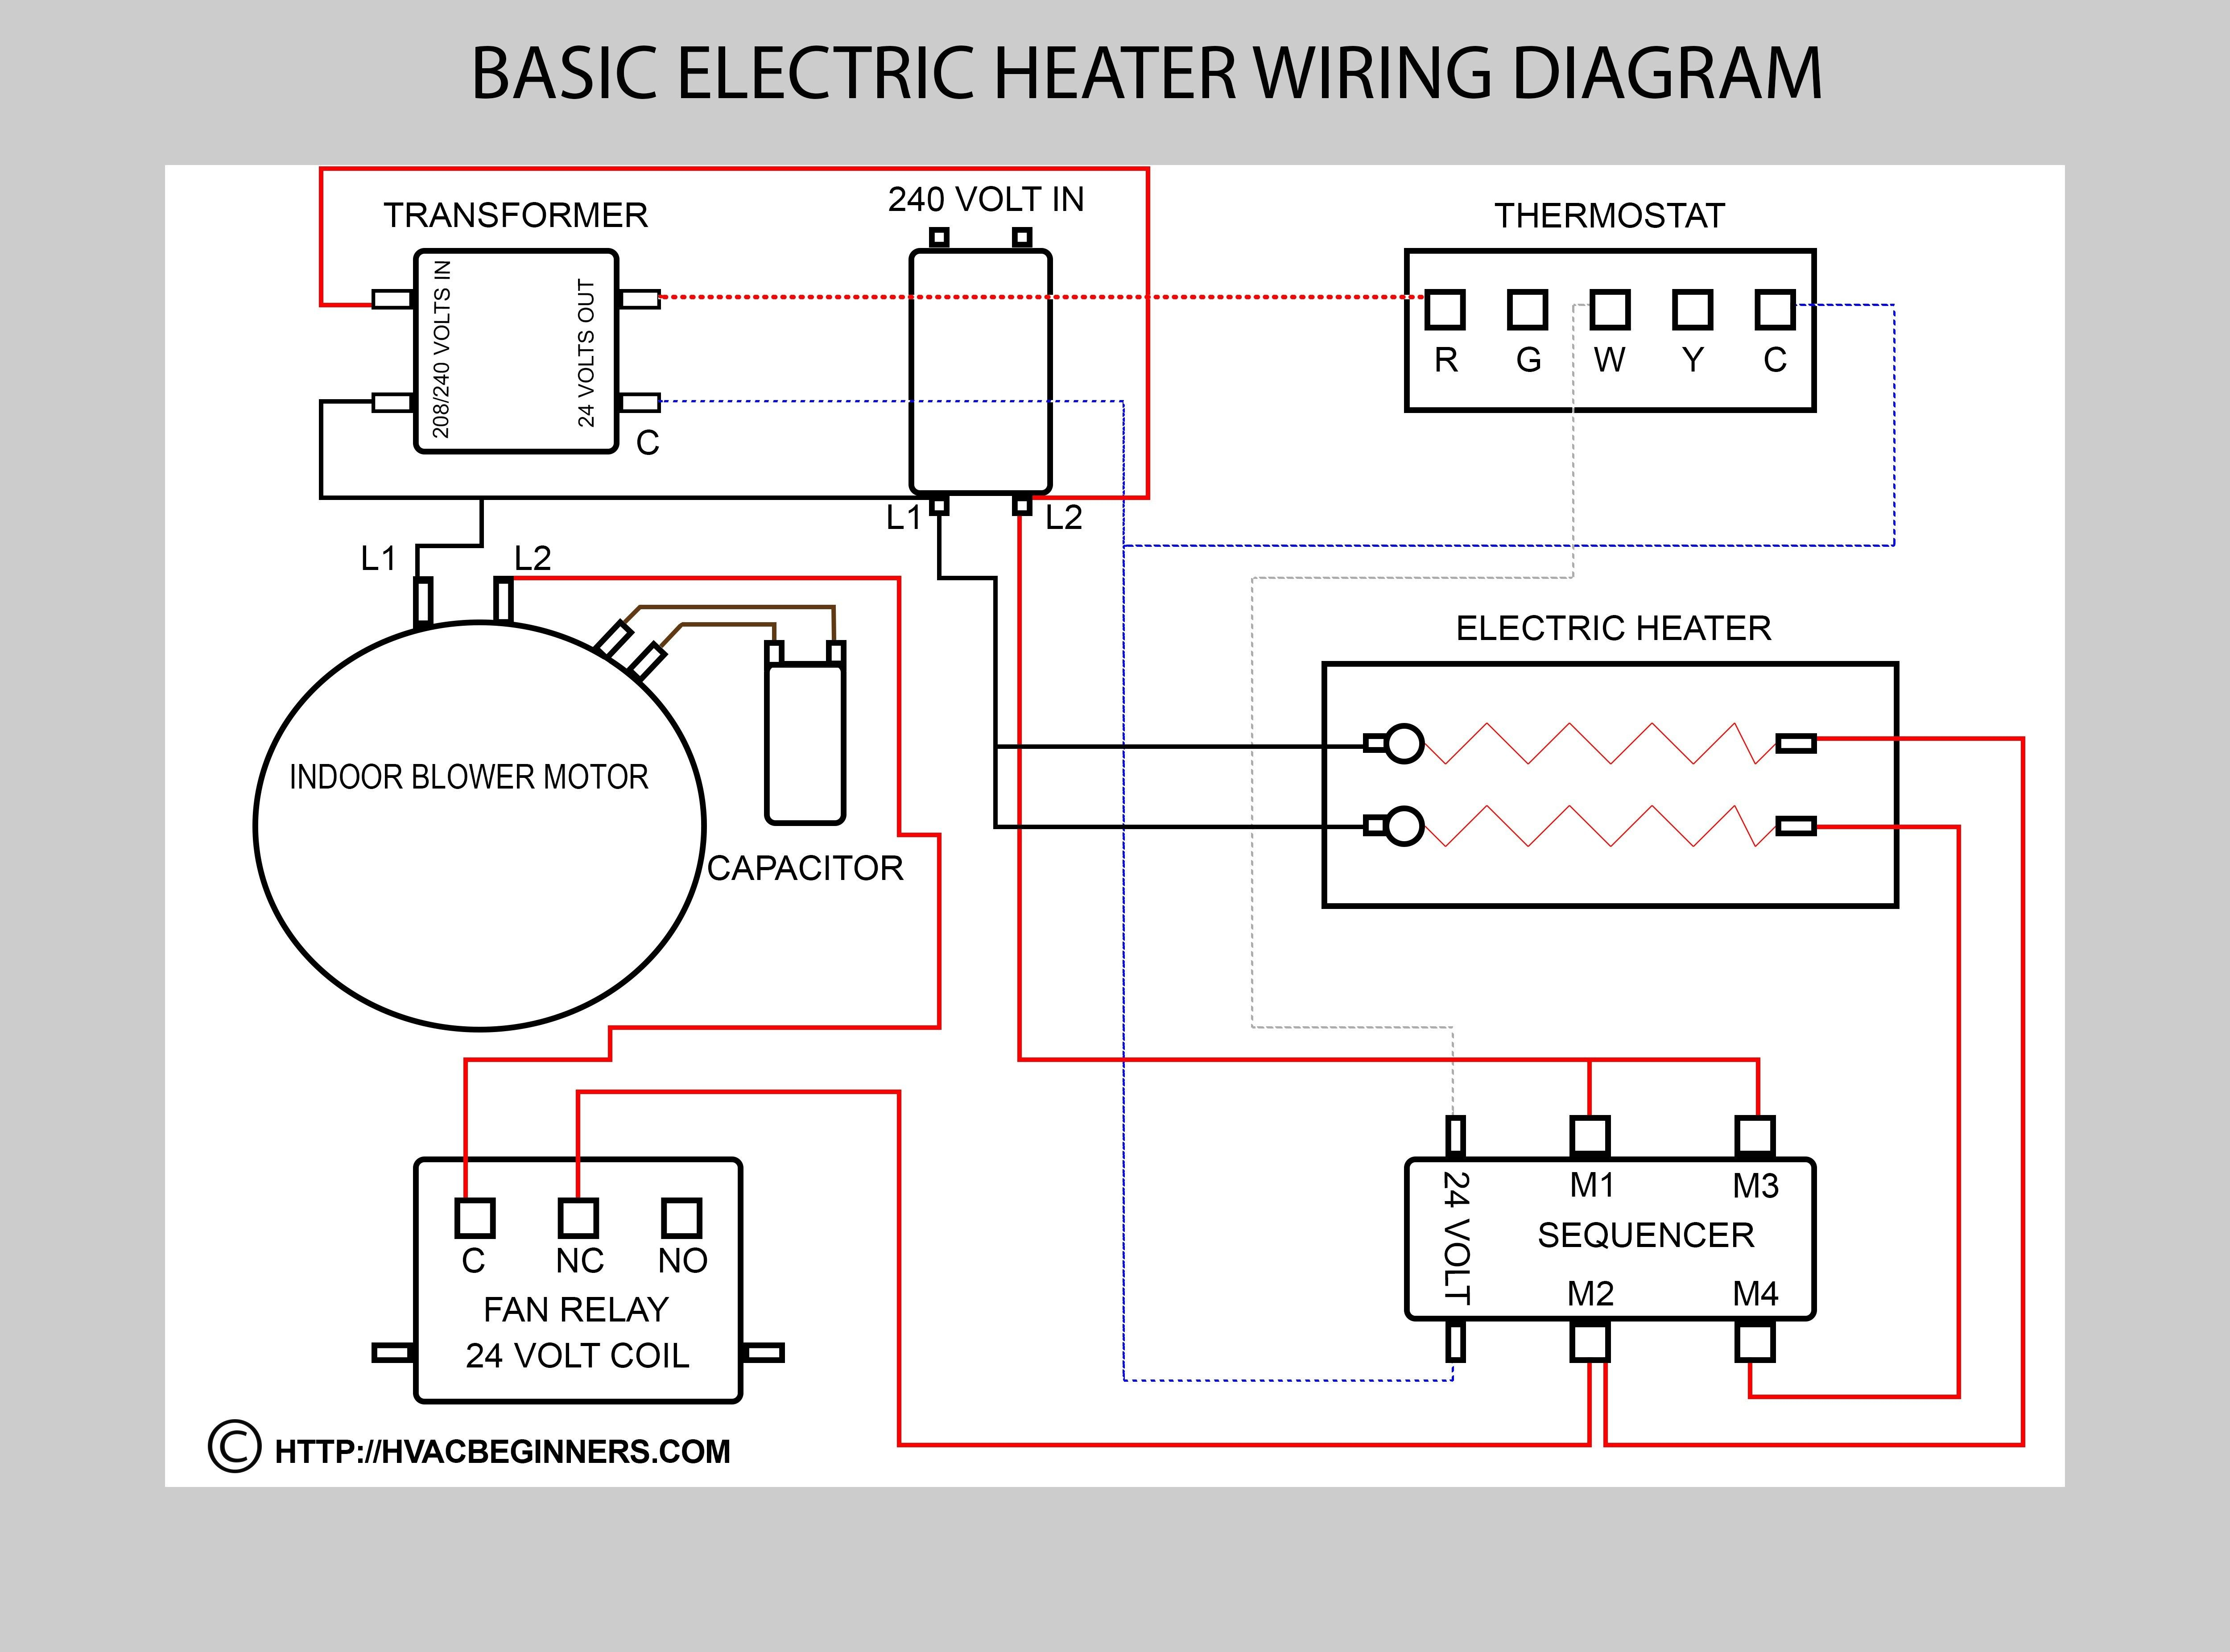 Wiring Diagram Car Wash #diagram #diagramtemplate #diagramsample |  Termostato, Tecnologia electronica, Termostato inteligentePinterest